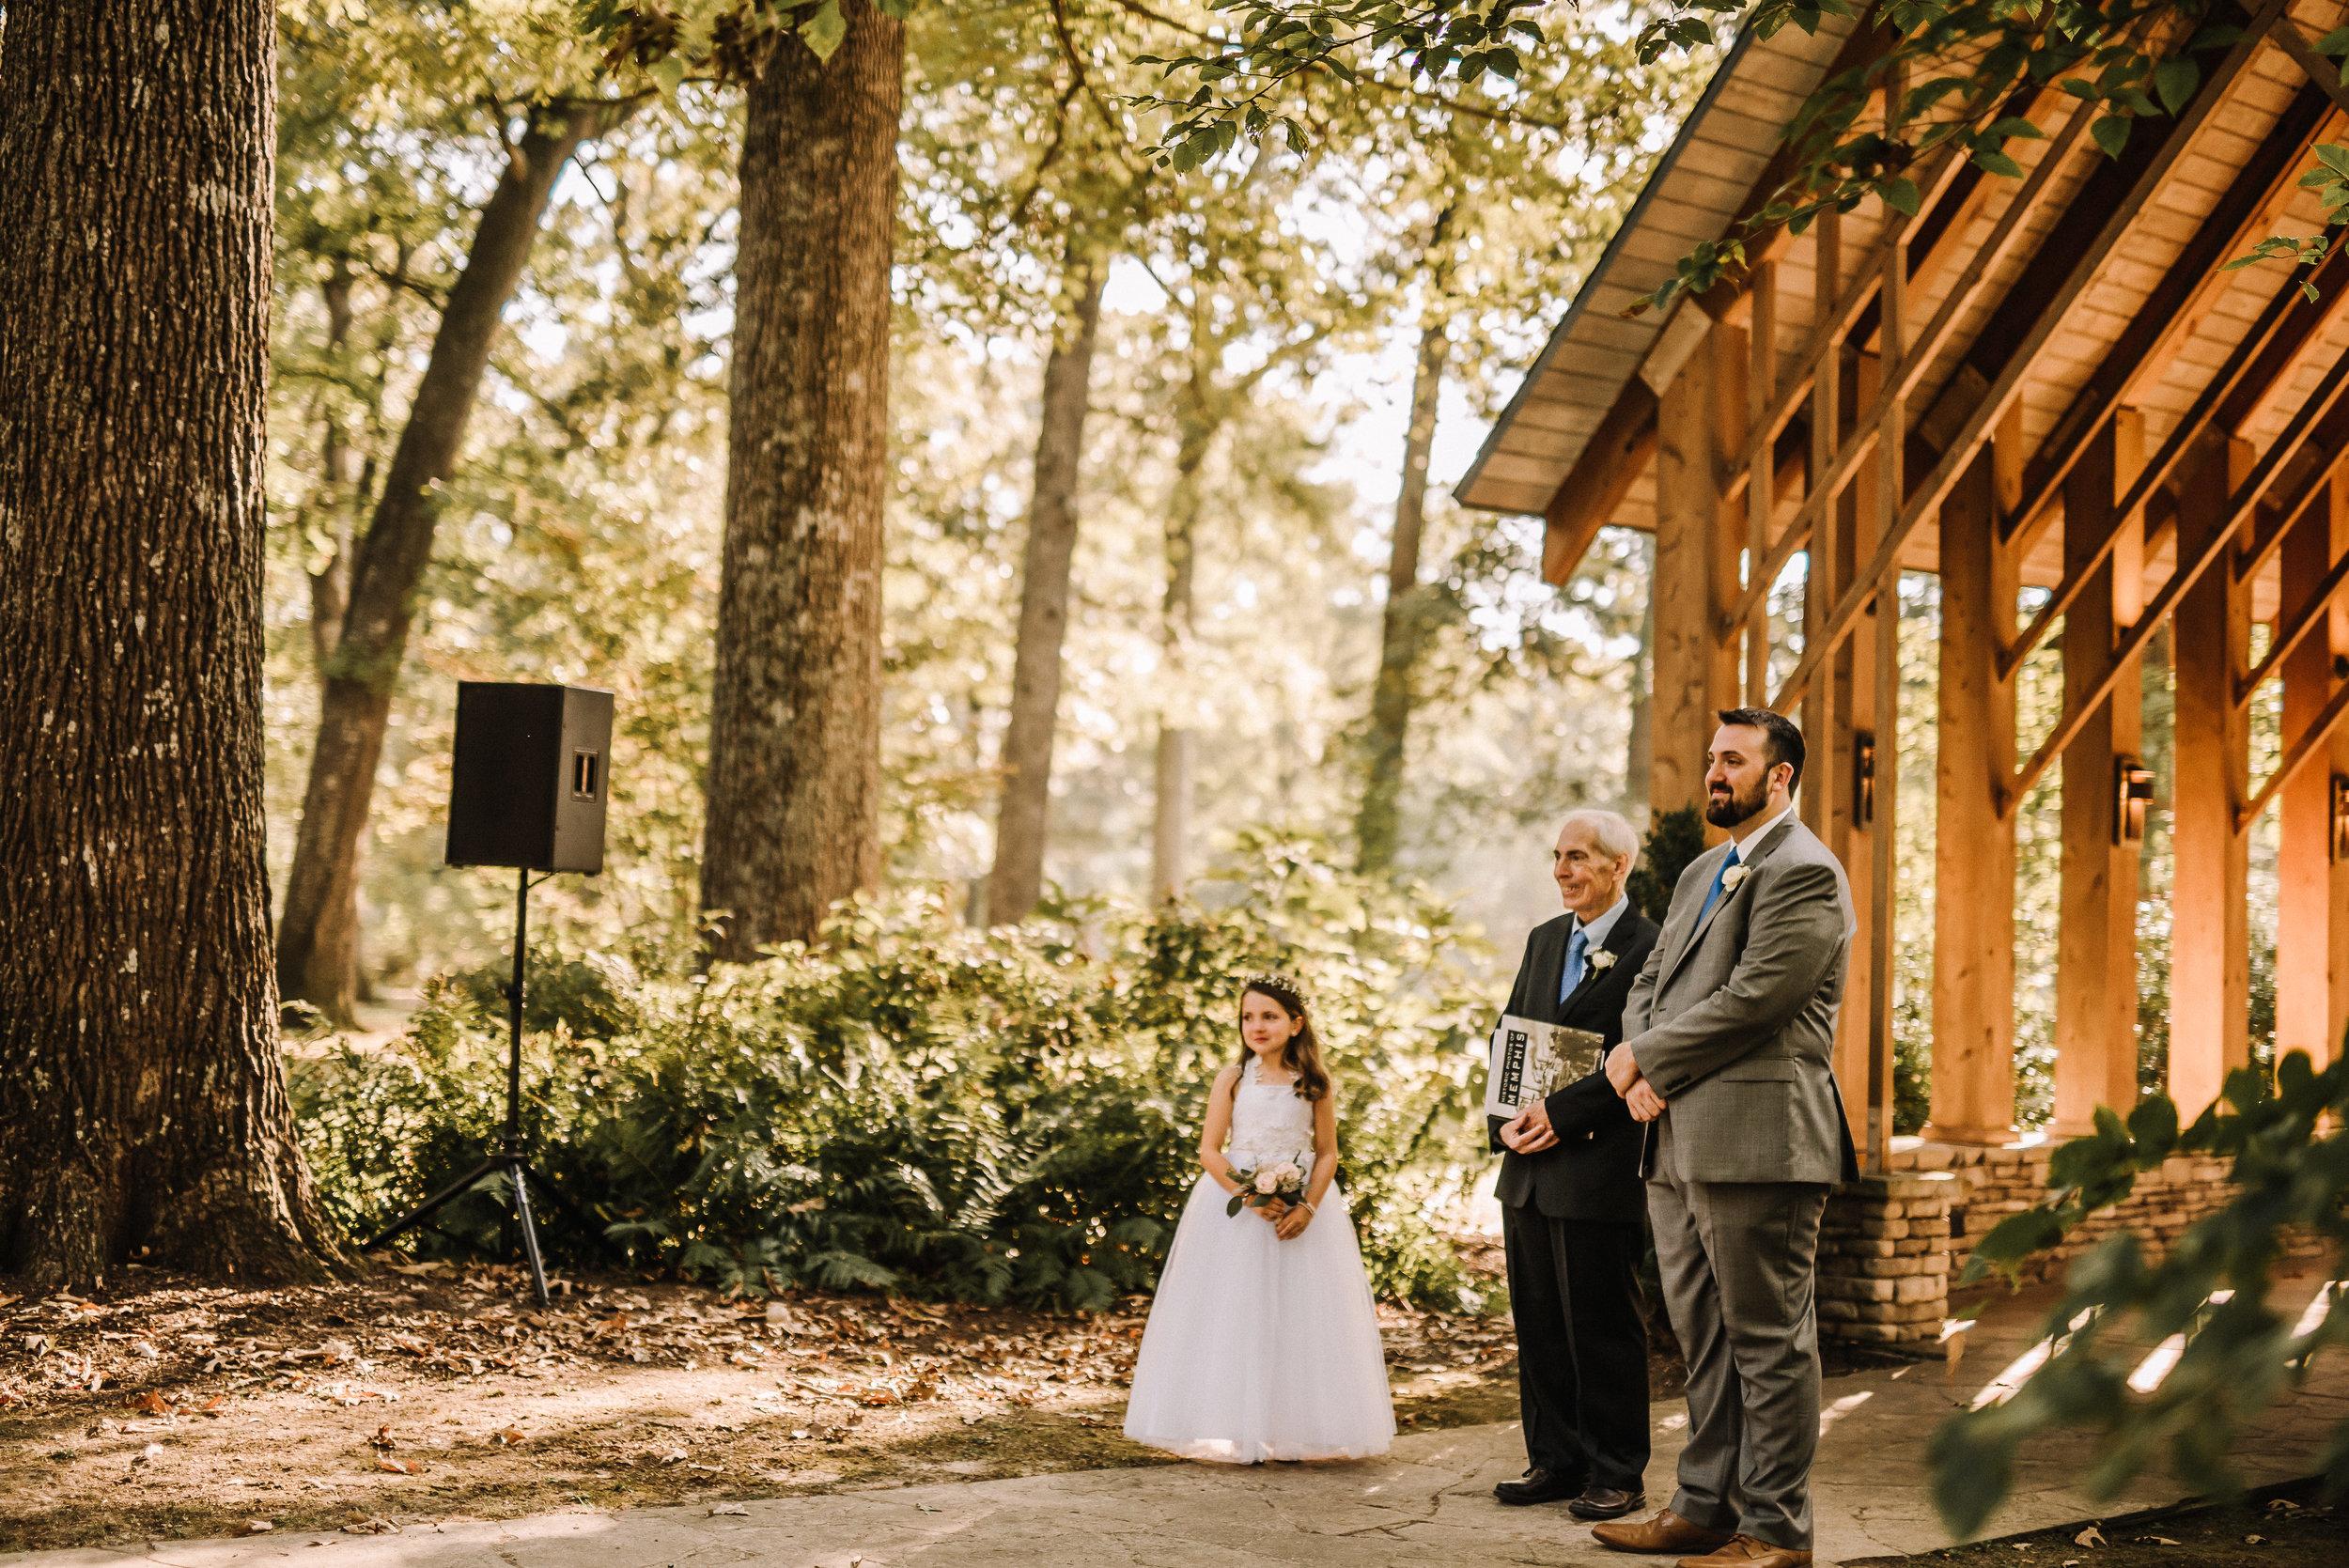 O'Brien-Wedding_Botanic-Gardens_Ashley-Benham-Photography-338.jpg